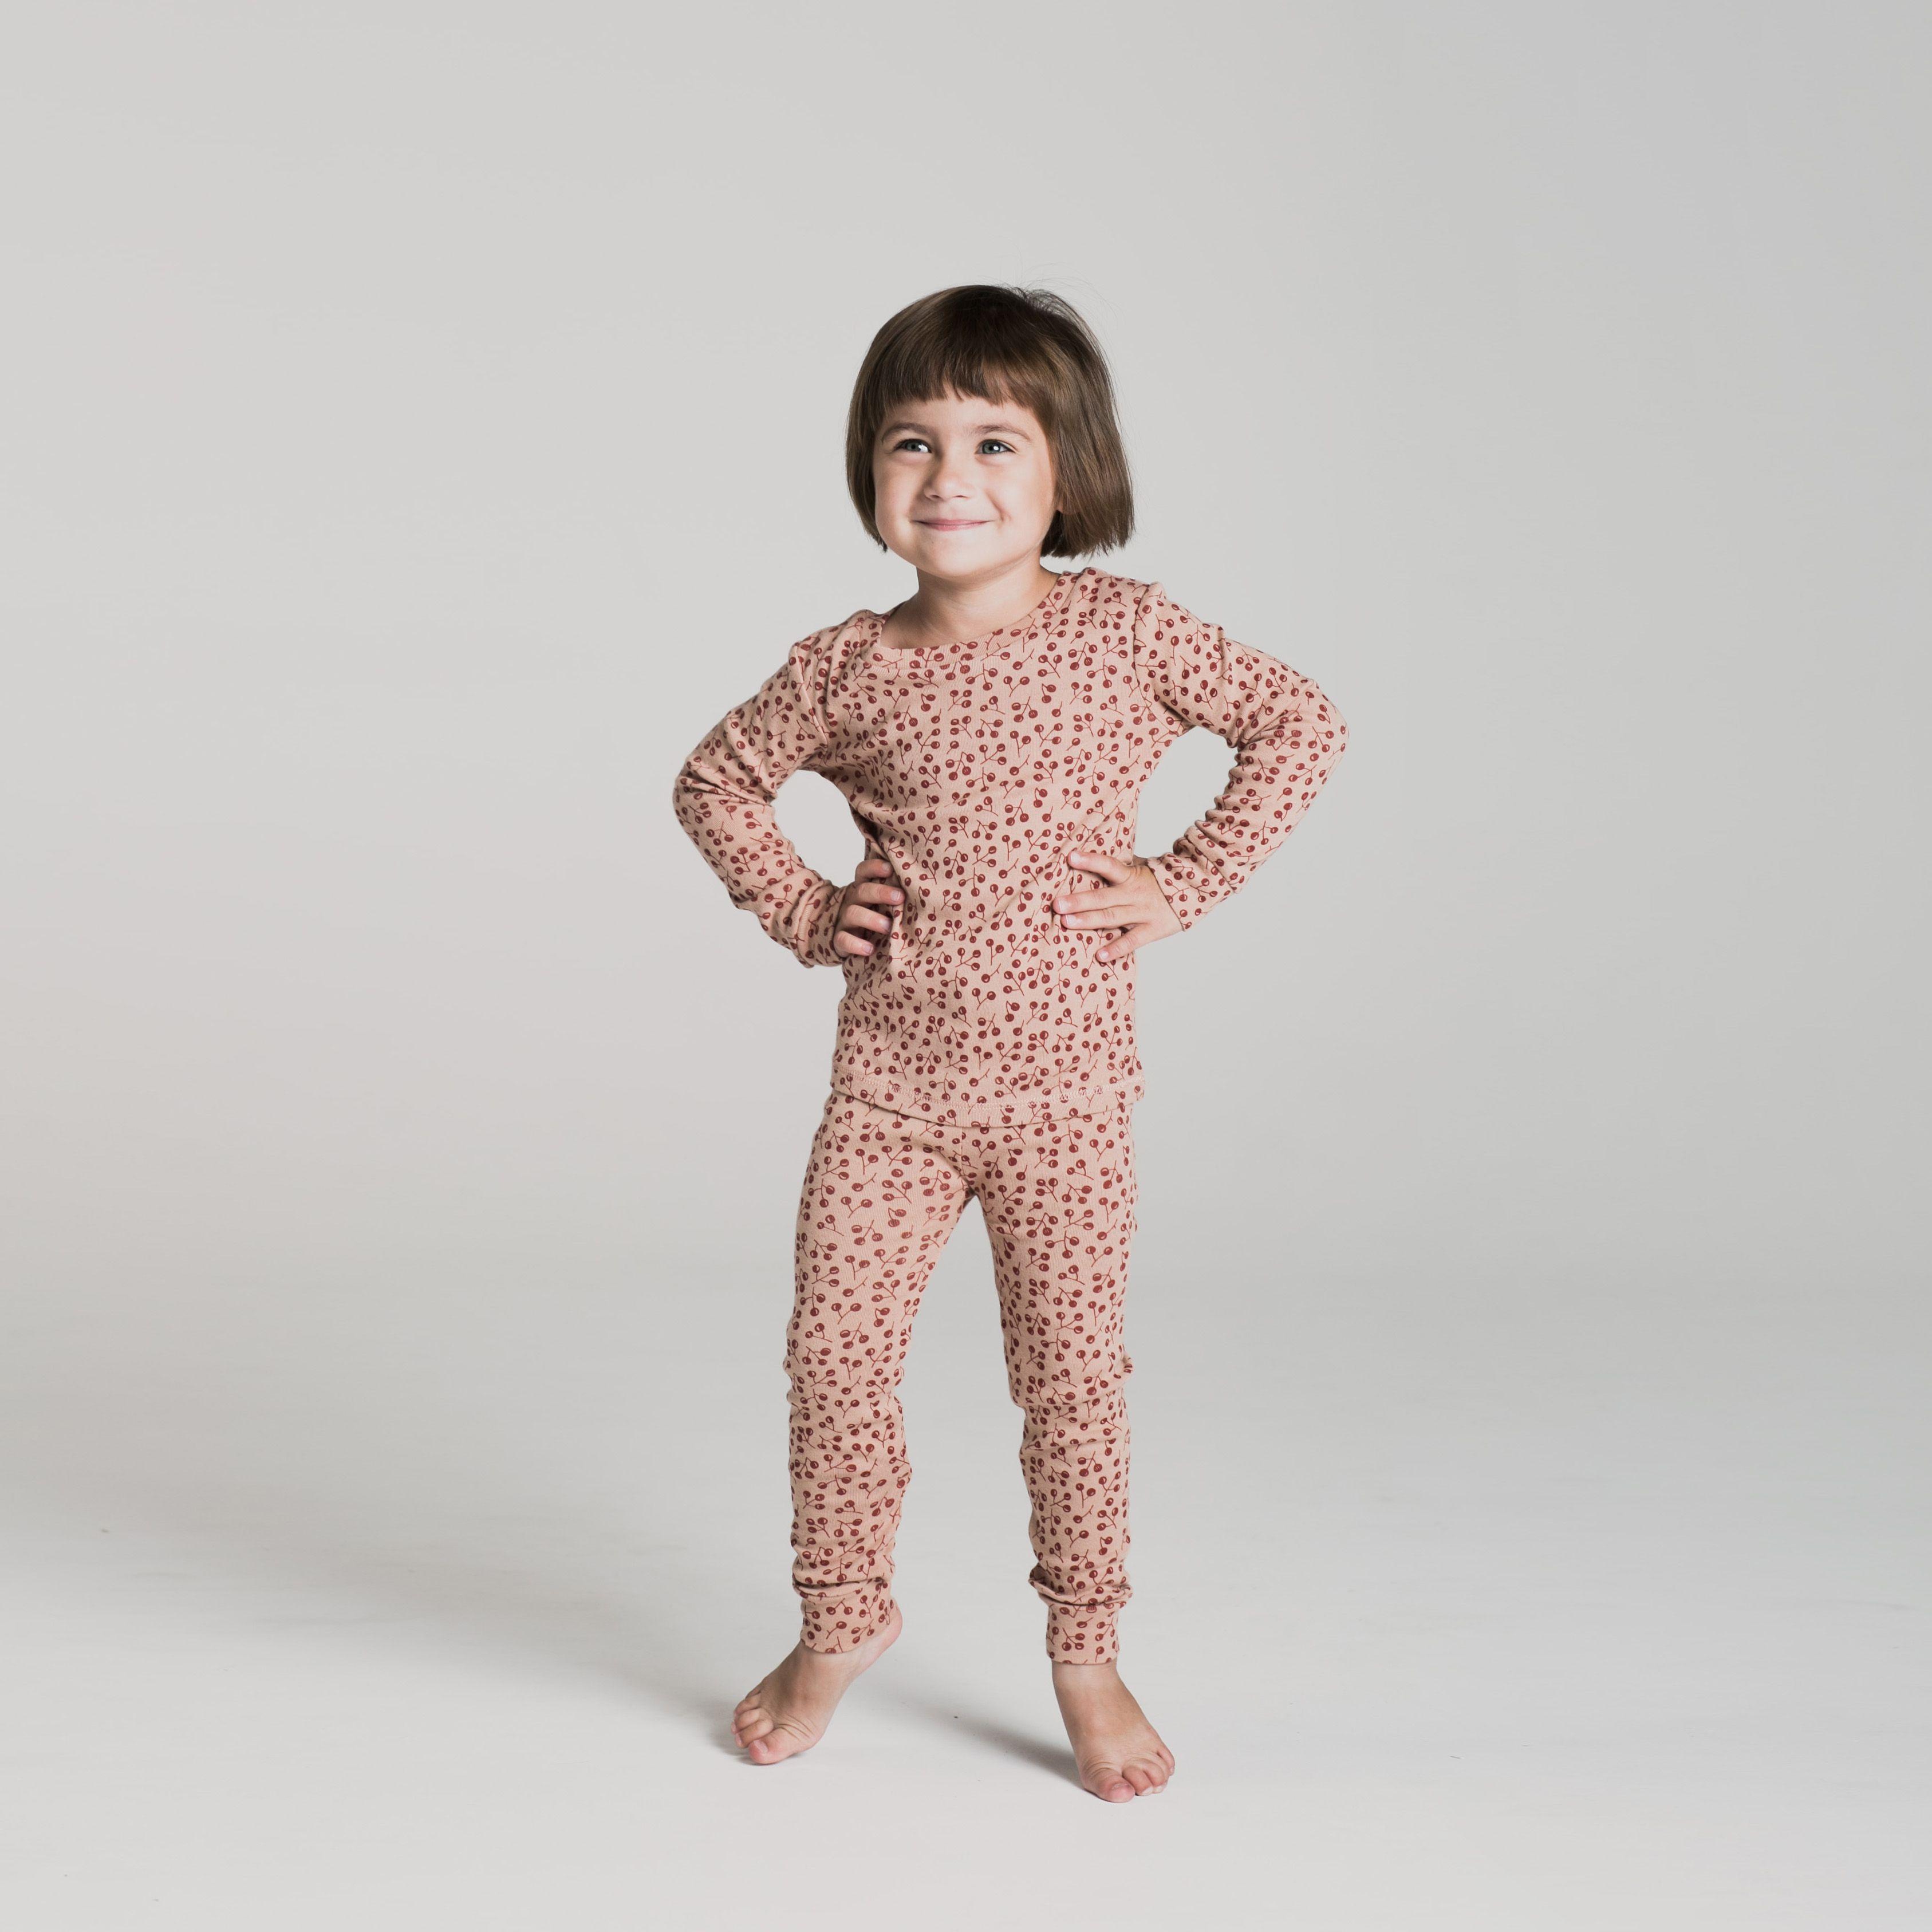 c909ad7d0 Rylee and Cru Organic Cotton Pajamas